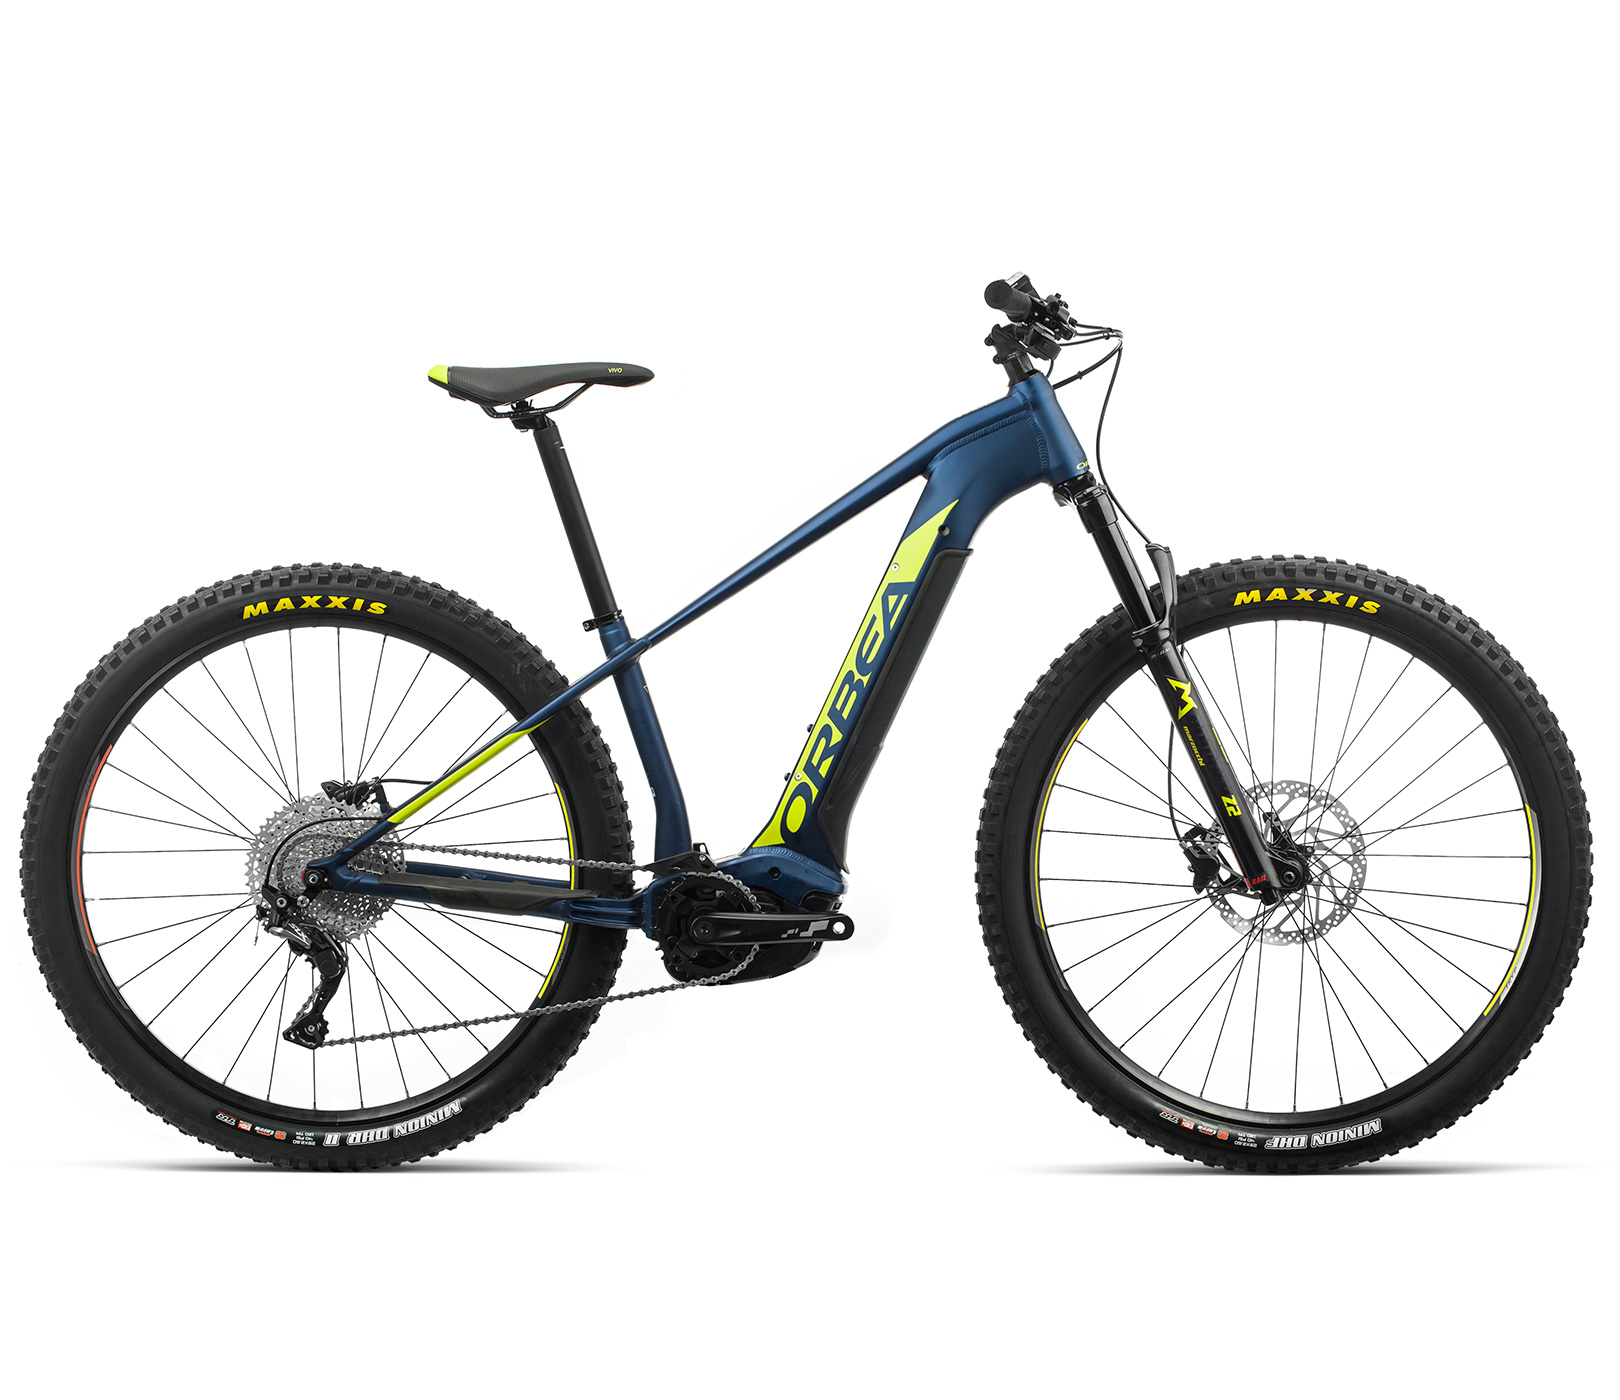 ORBEA WILD HT30 29 ebike - MARINE BLAUW MET / PISTACHE (DOF) @G-Bikes